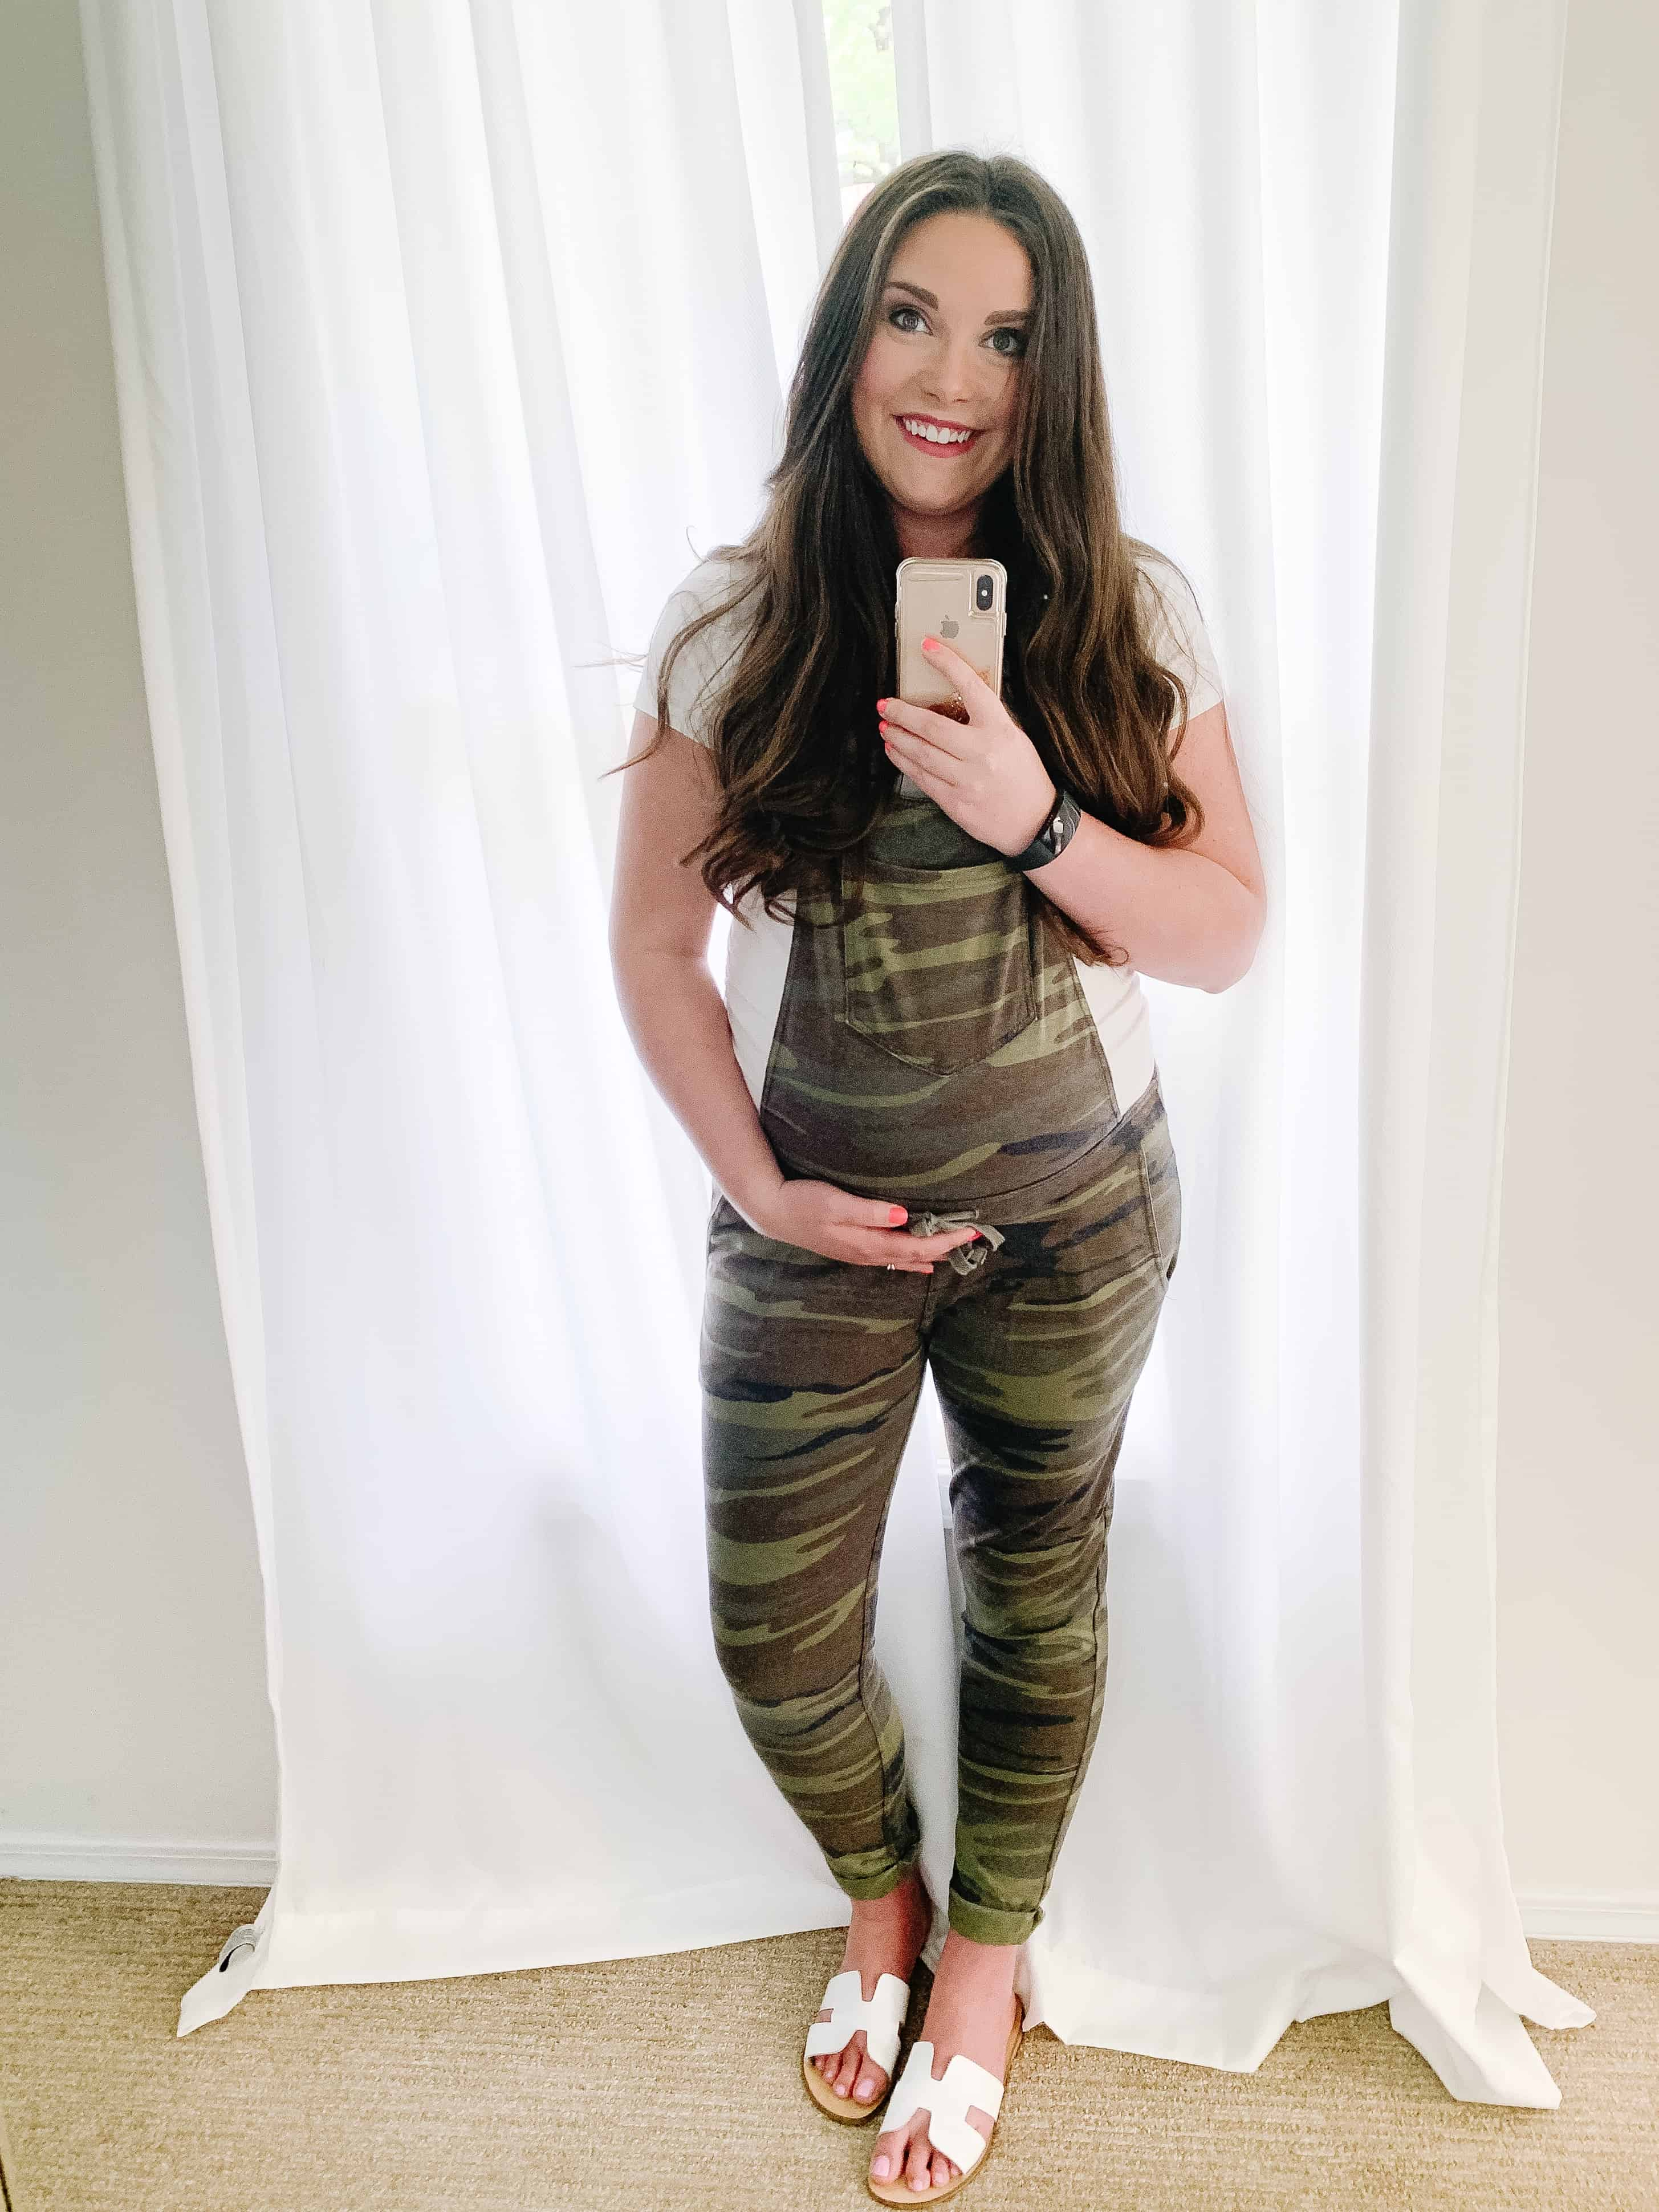 Pregnant mom selfie in overalls